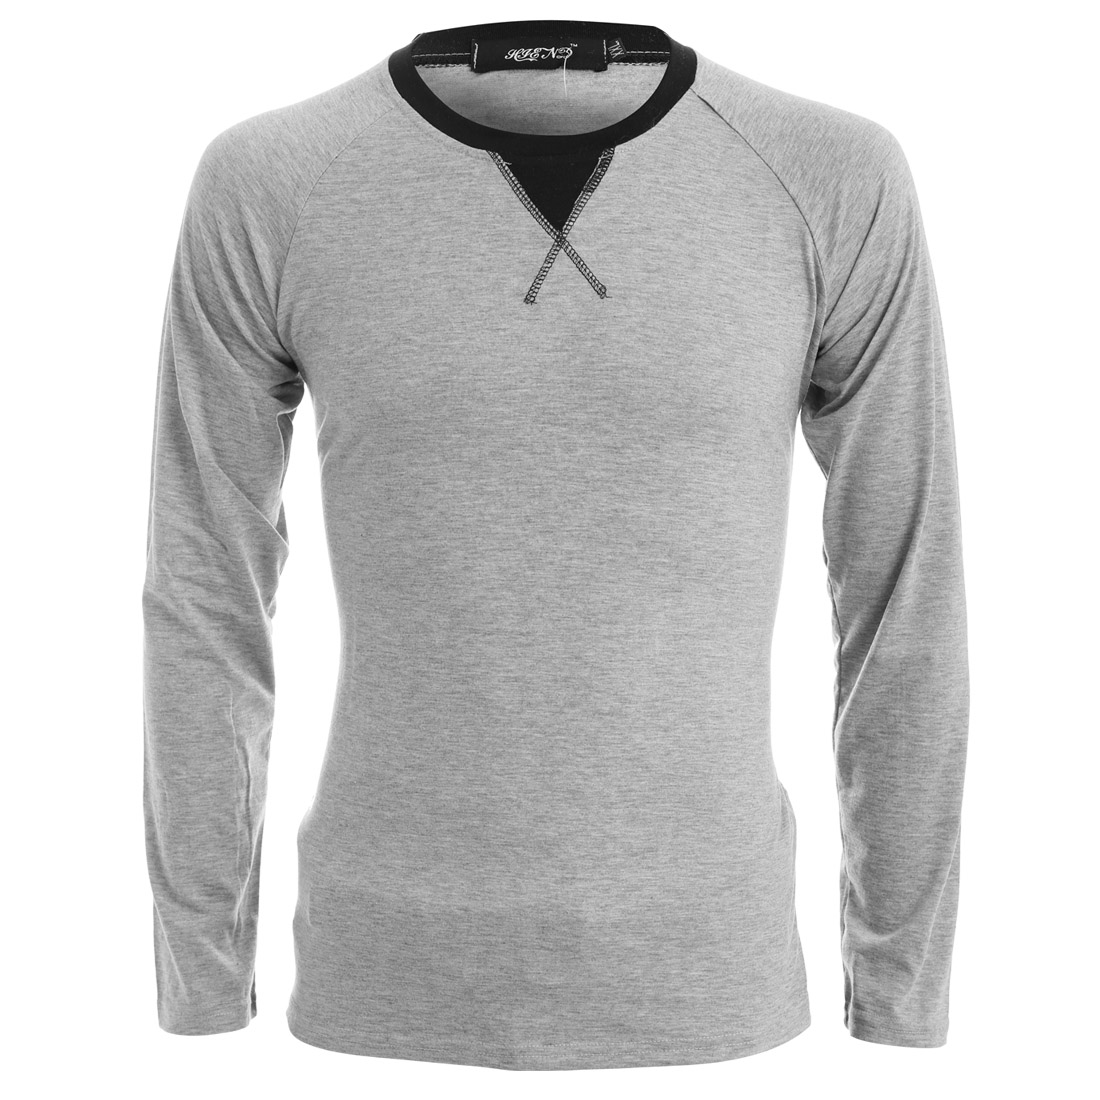 Man Round Neck Long Sleeve Stretchy Light Gray T-Shirts S